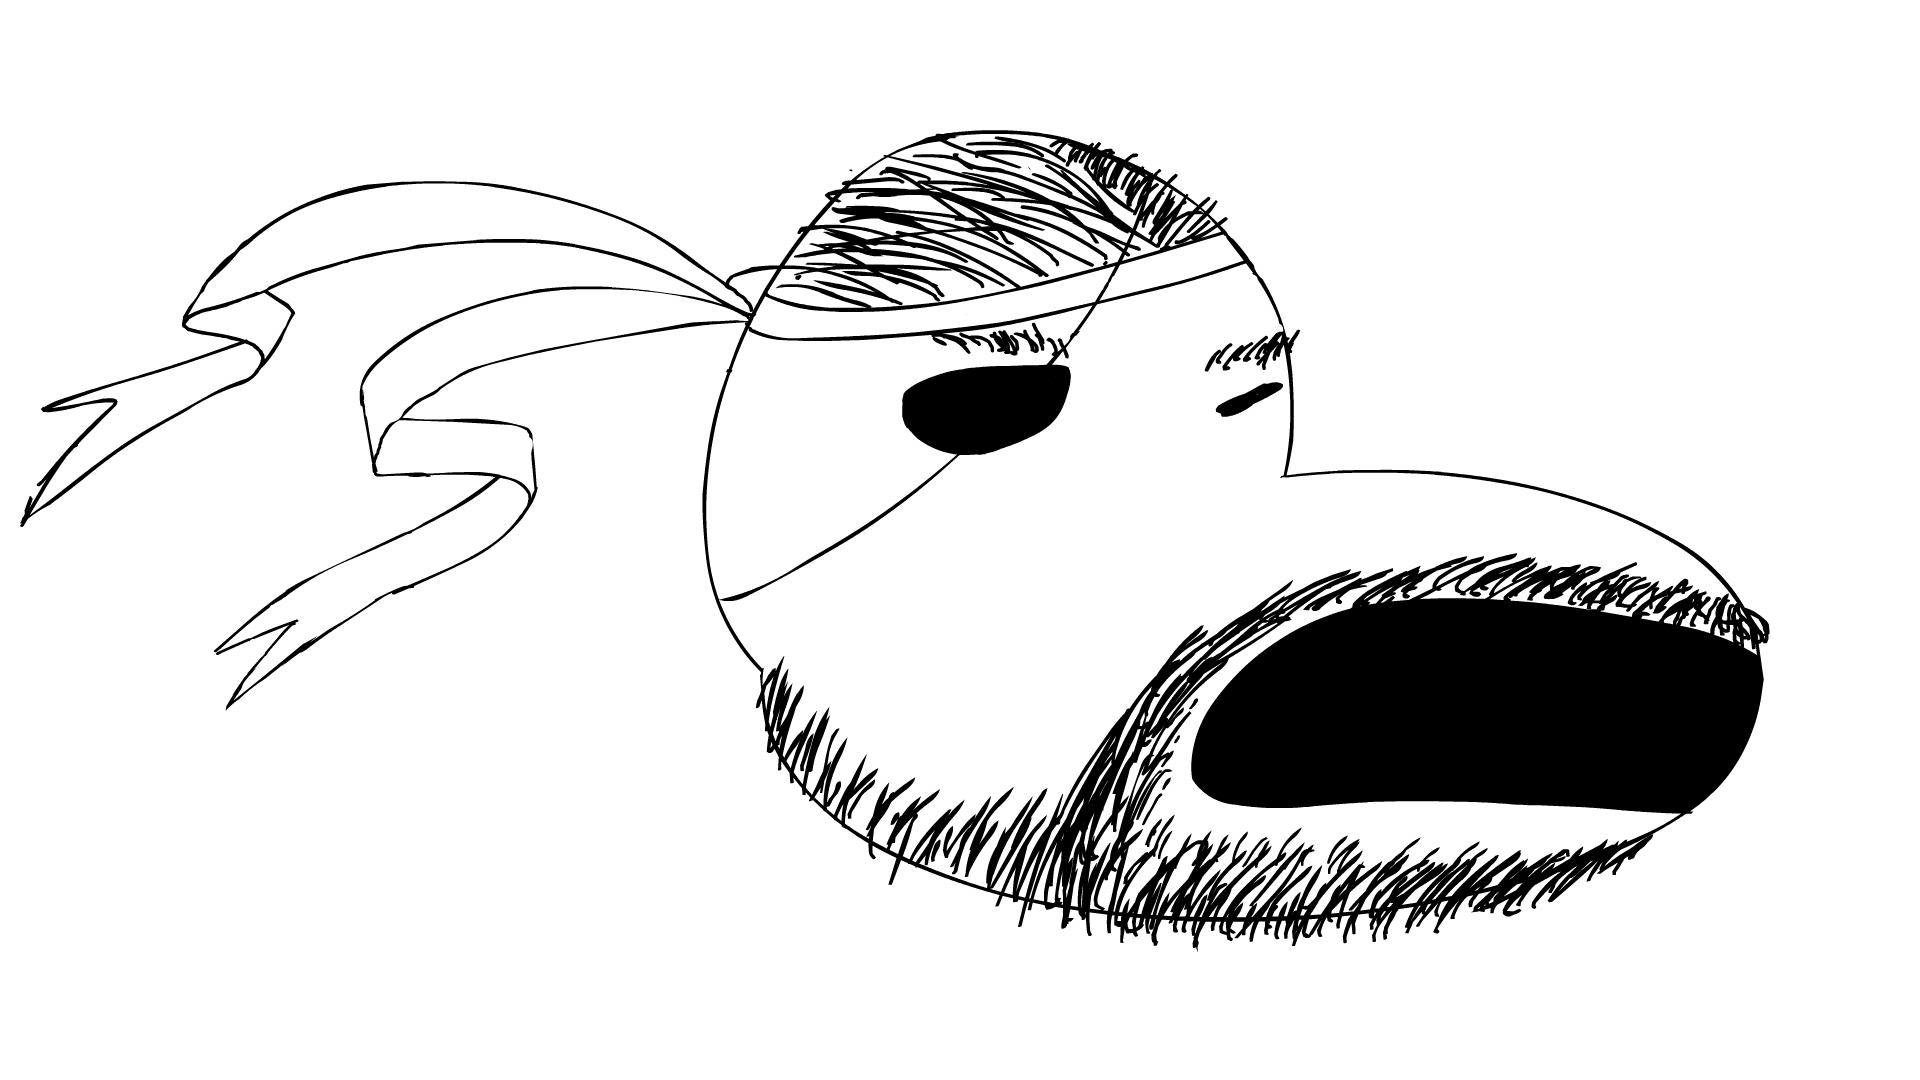 Big Booosss sketch thing